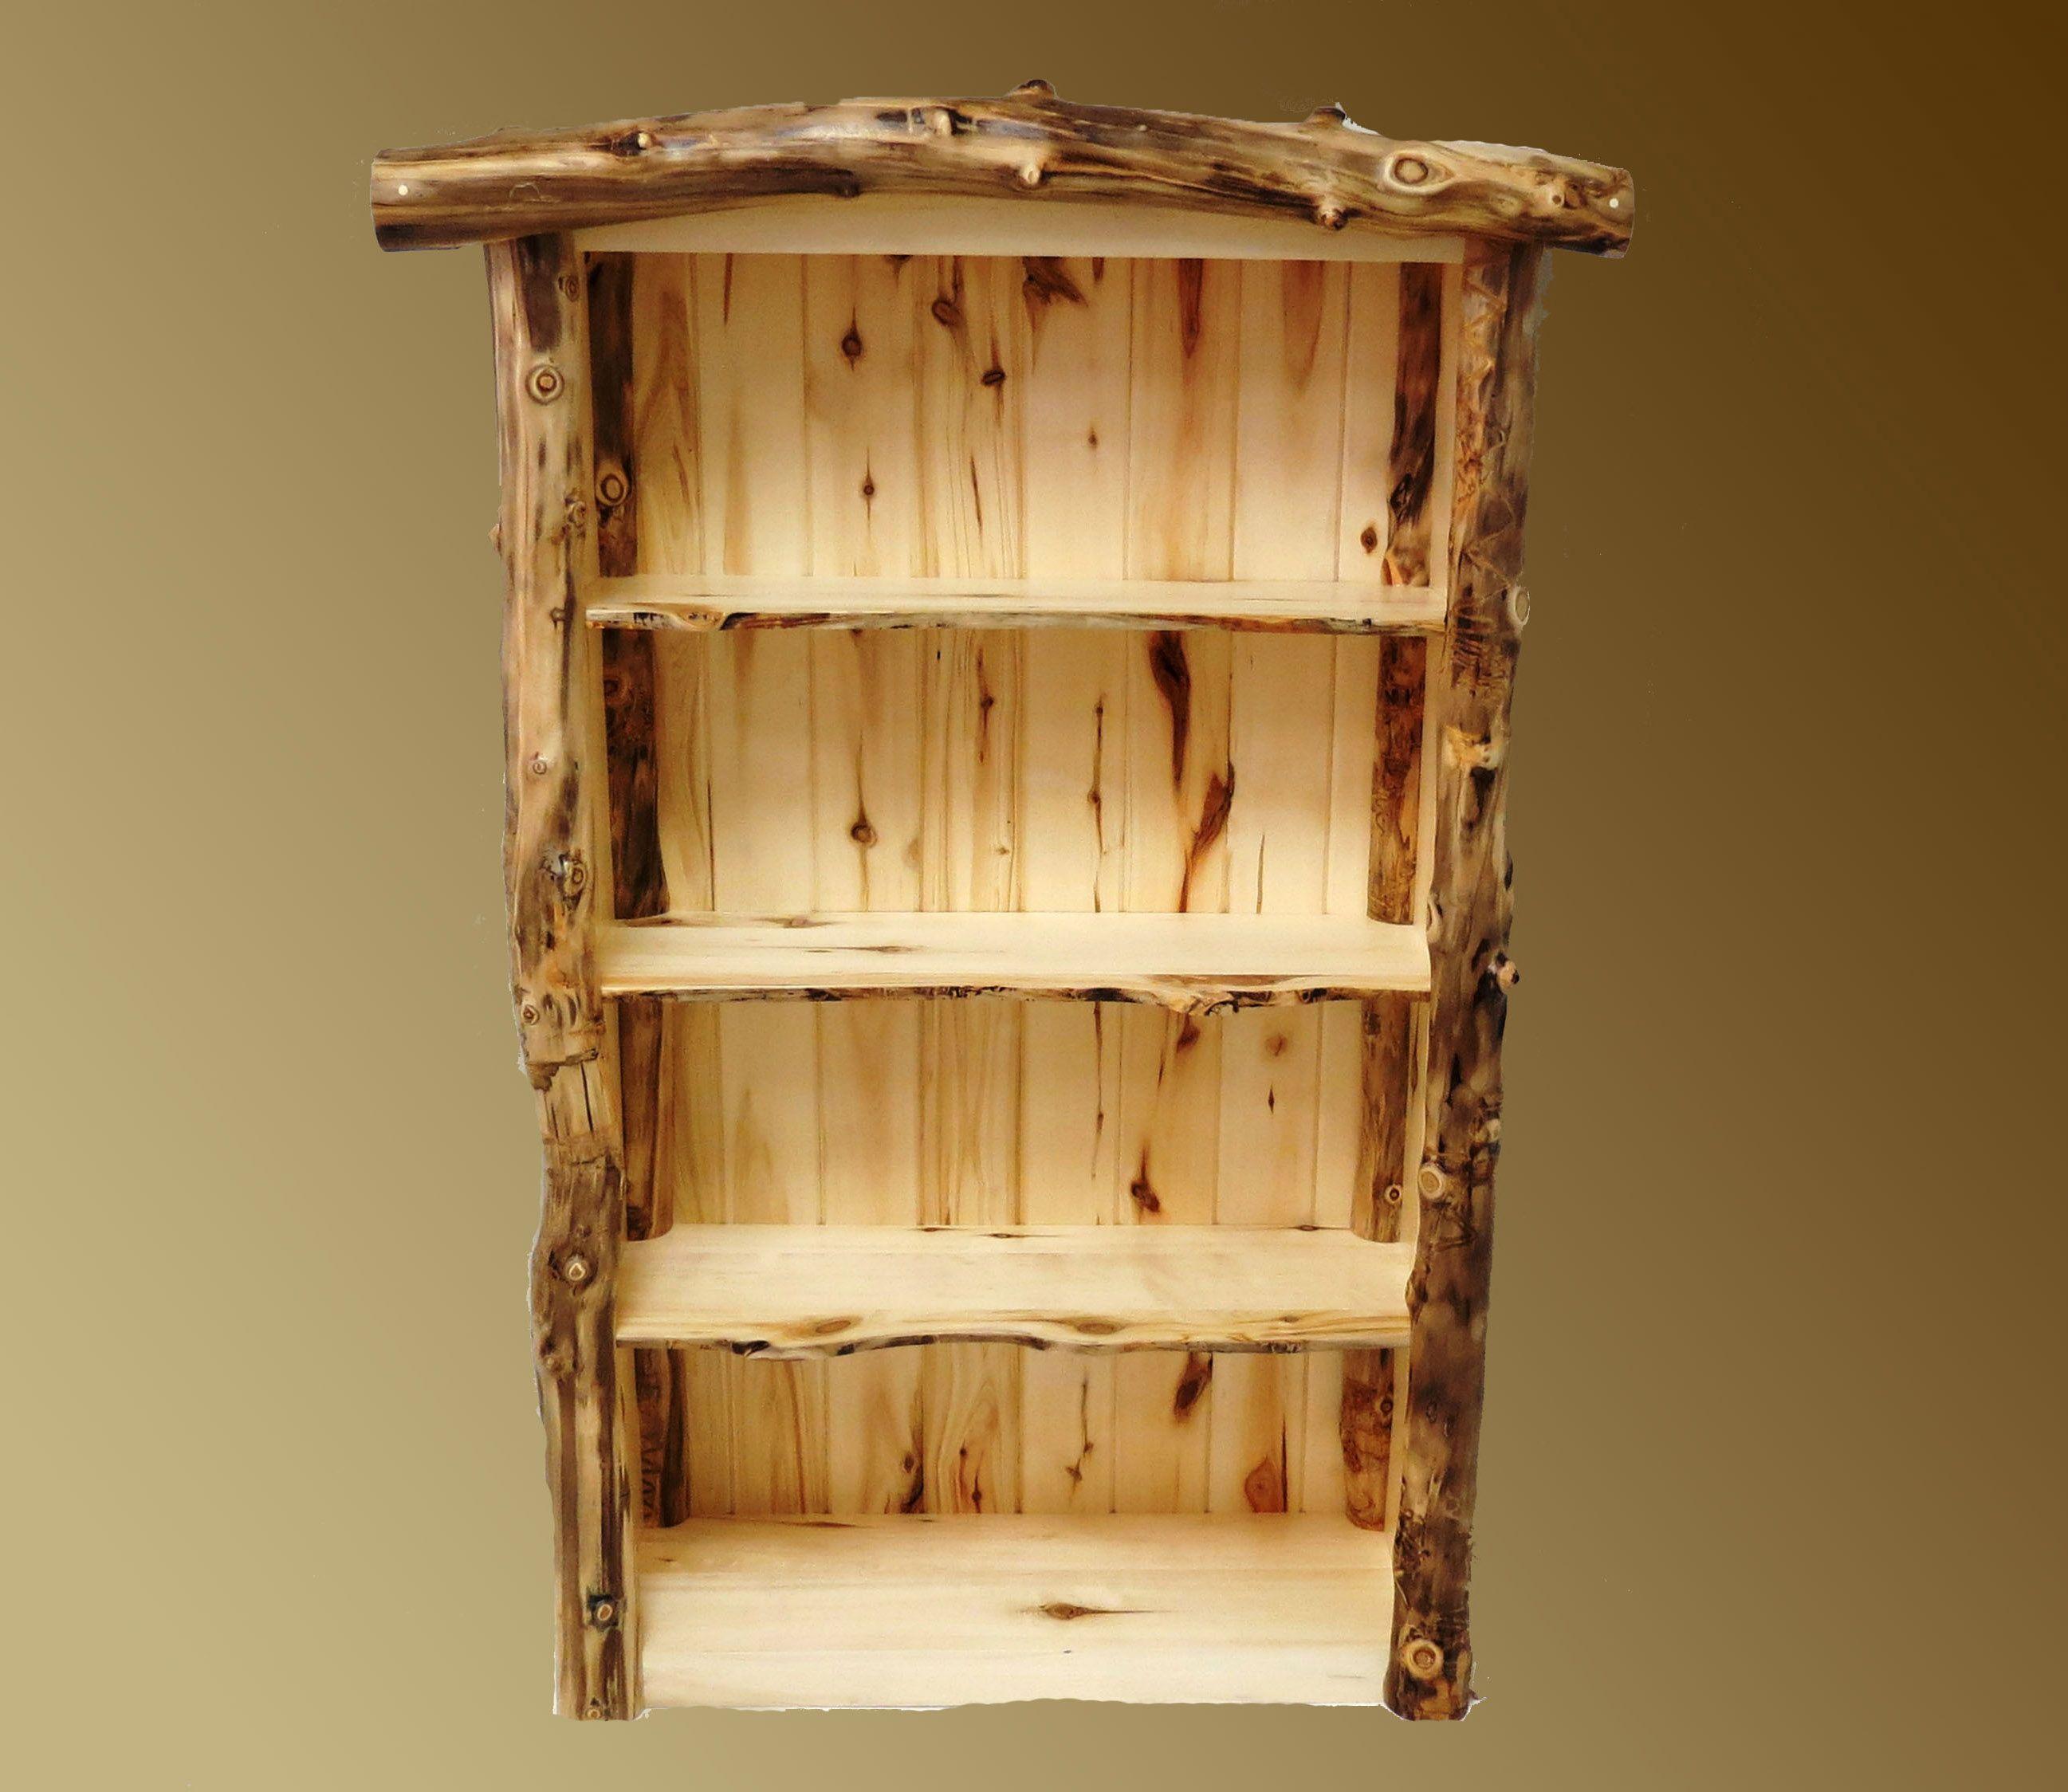 industrial wood etageres display at ko room furniture living tob from case curios aspen cupboard